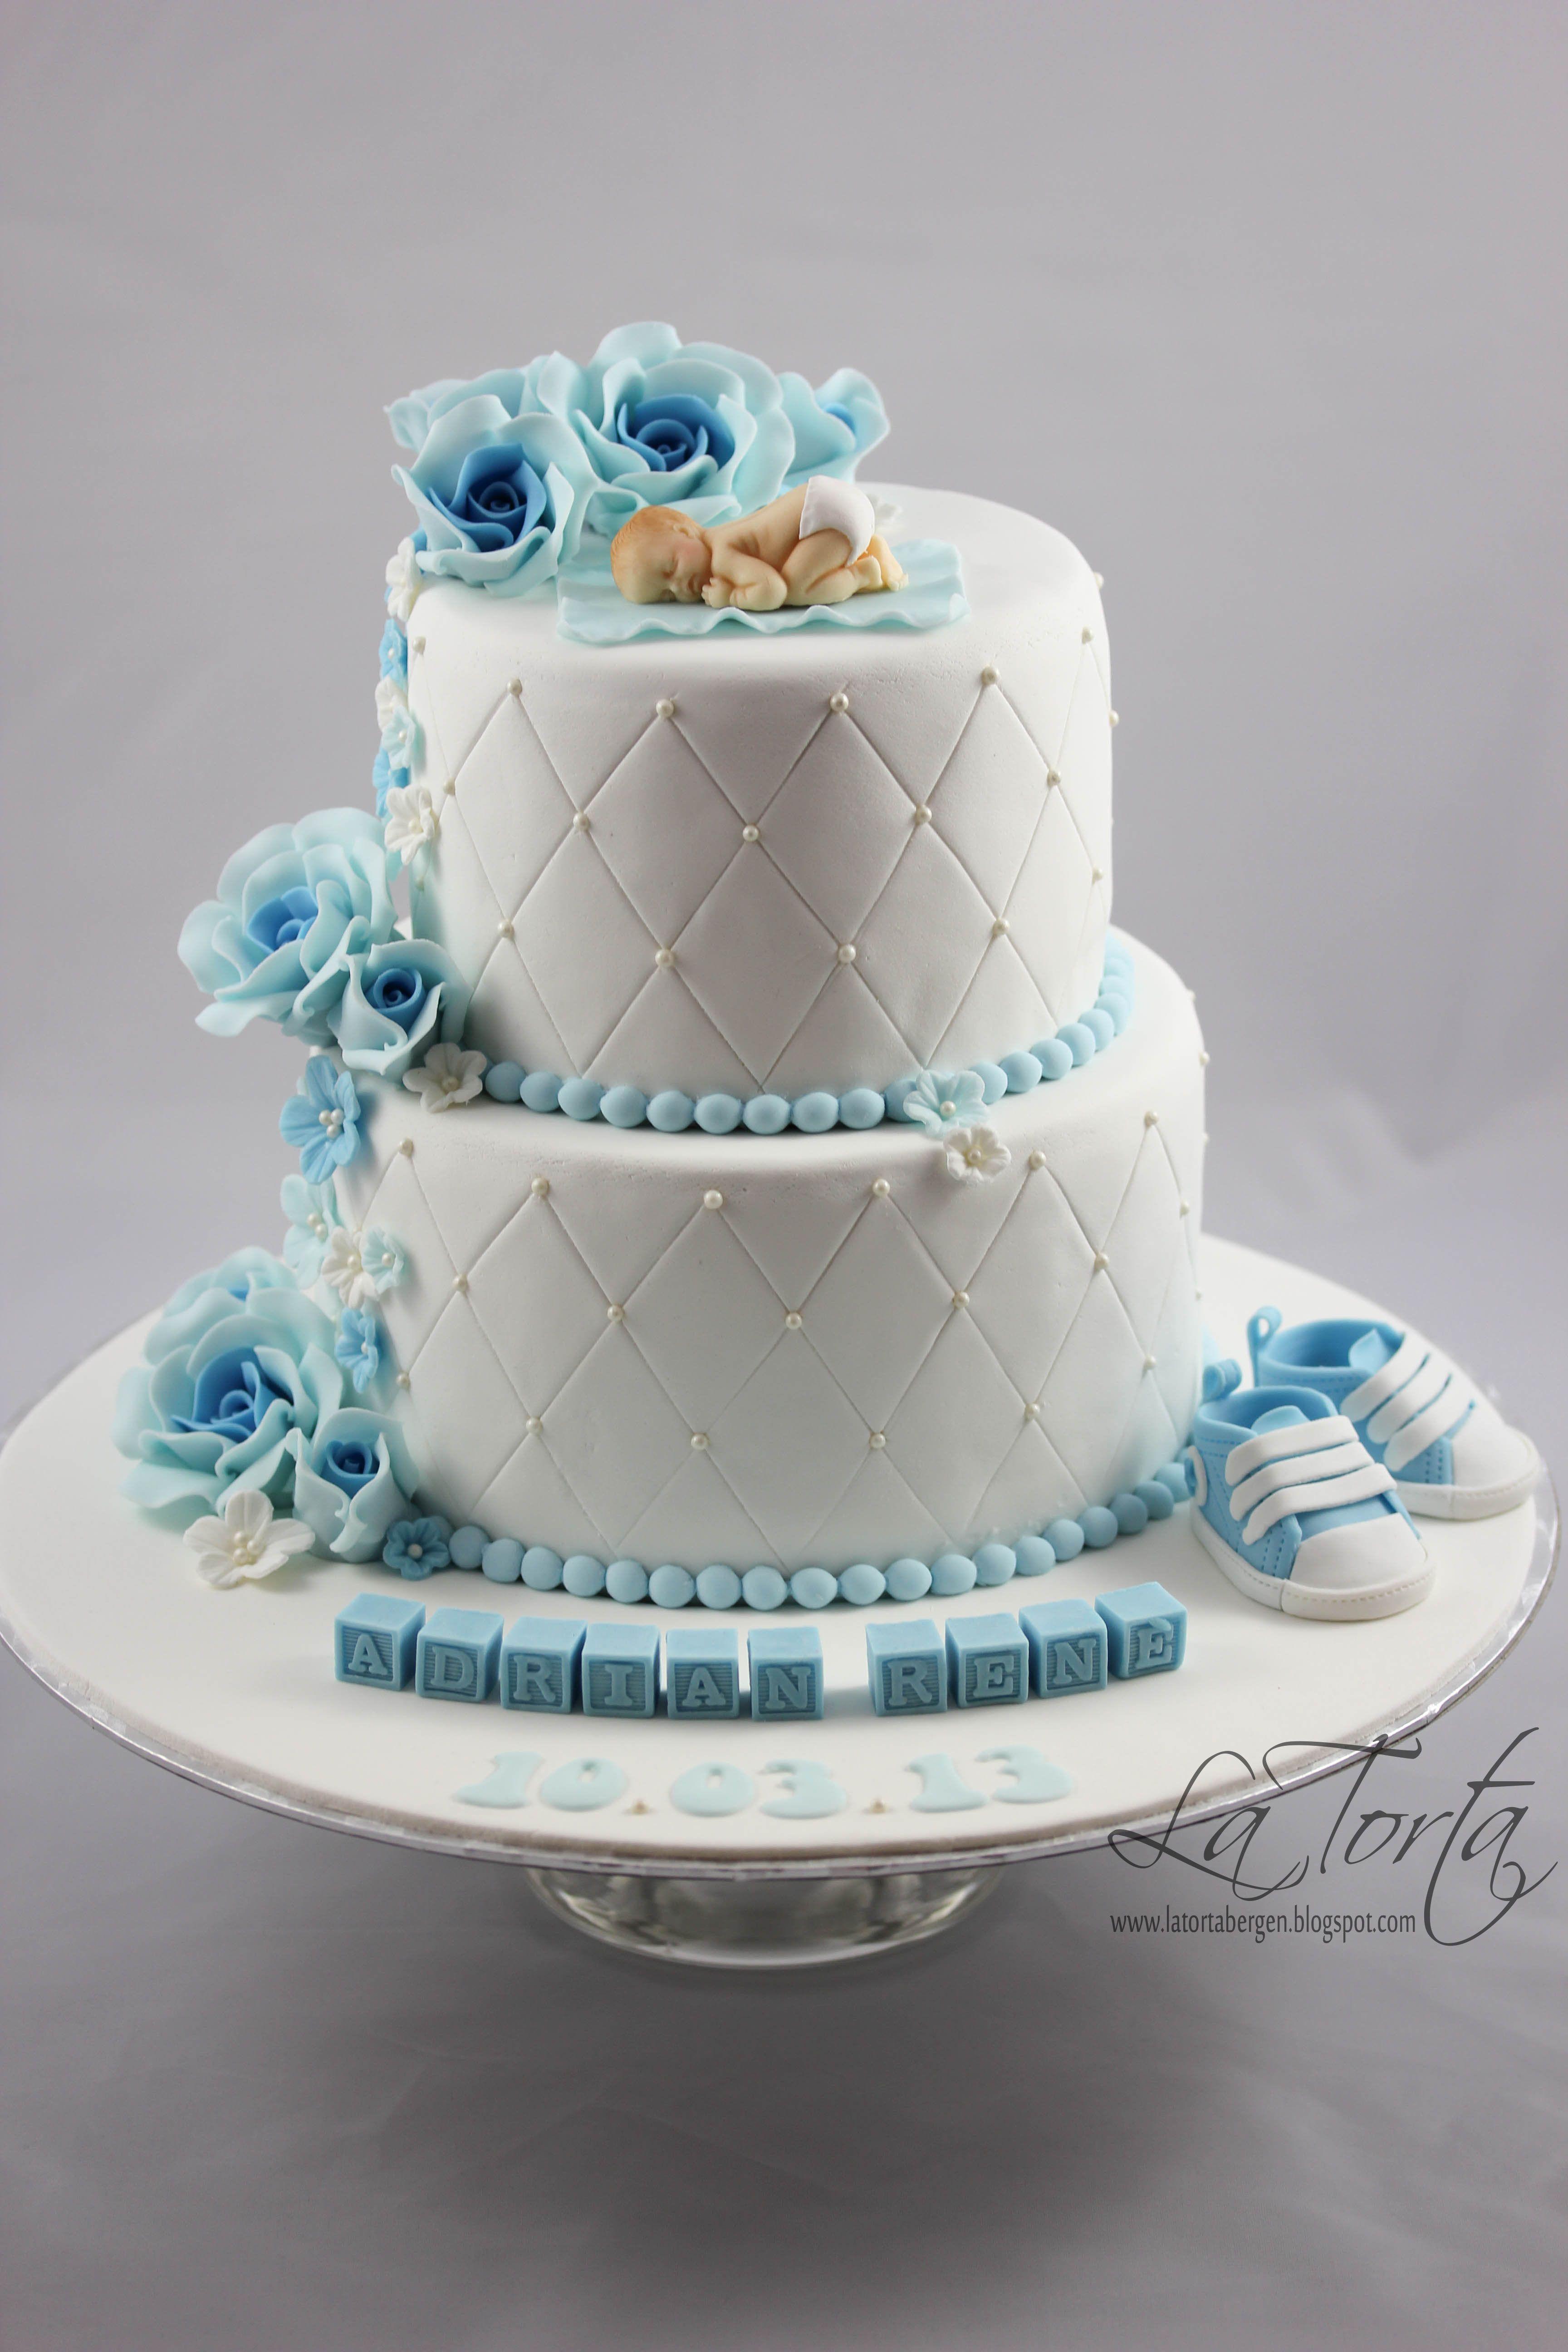 Pin Von Priya Avi Sasi Auf Cakes Pinterest Torte Taufe Torten